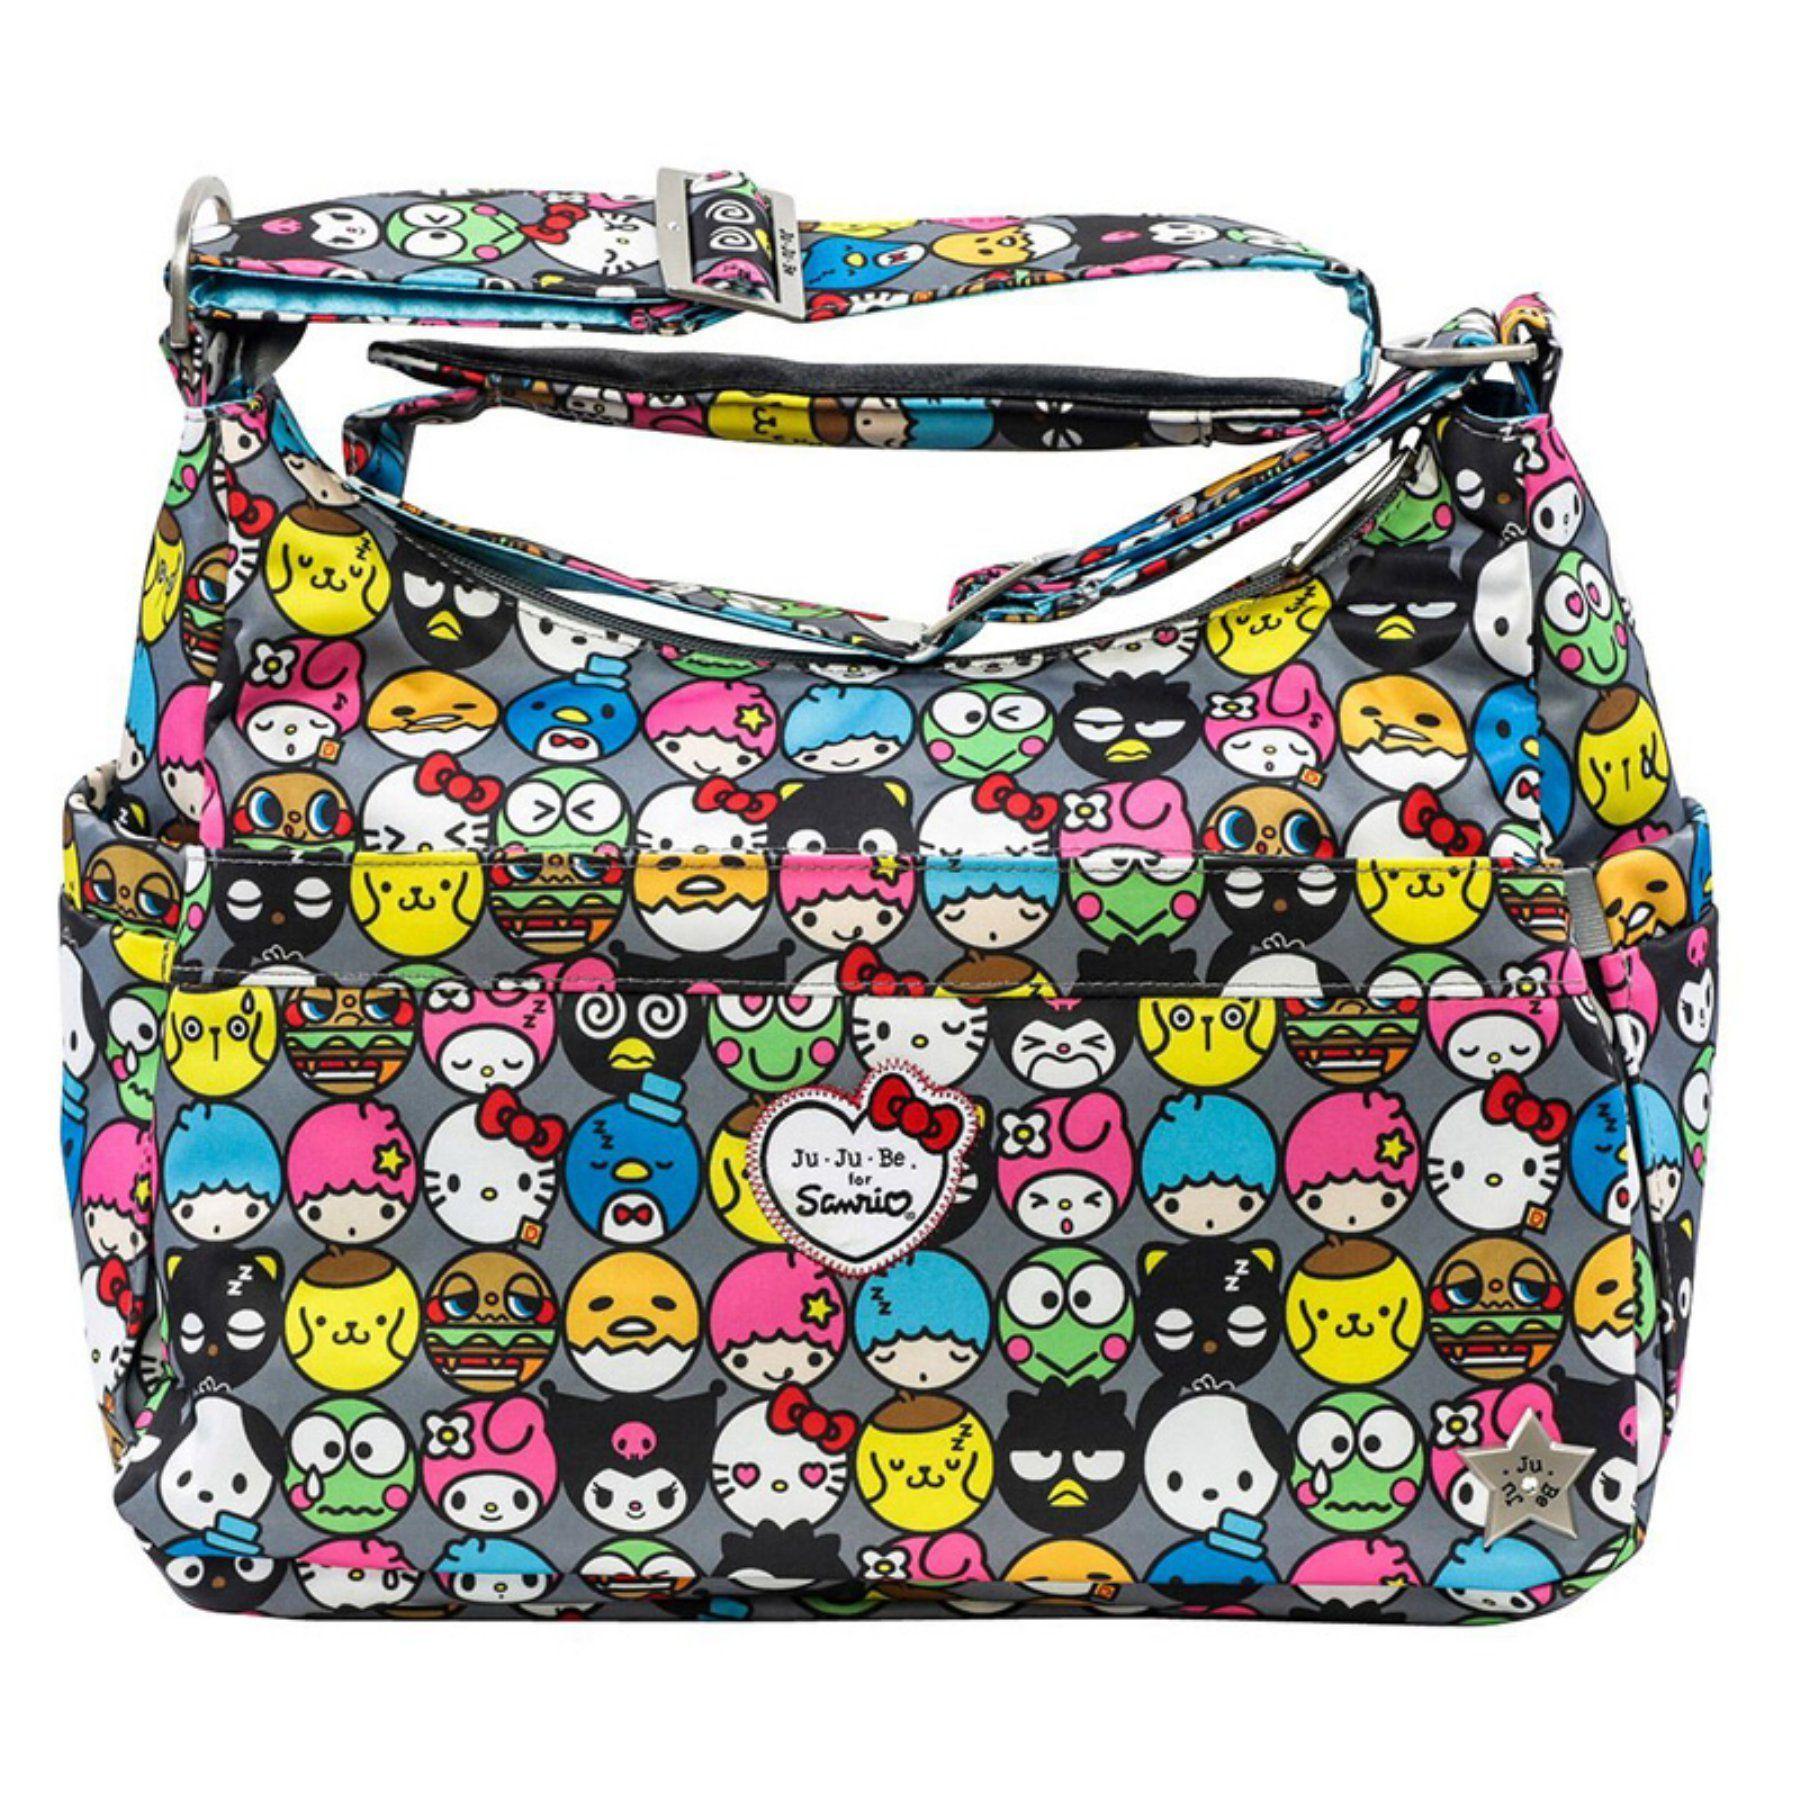 Ju Be O Kitty Friends Hobo Purse Diaper Bag 14hb01hk Hfr